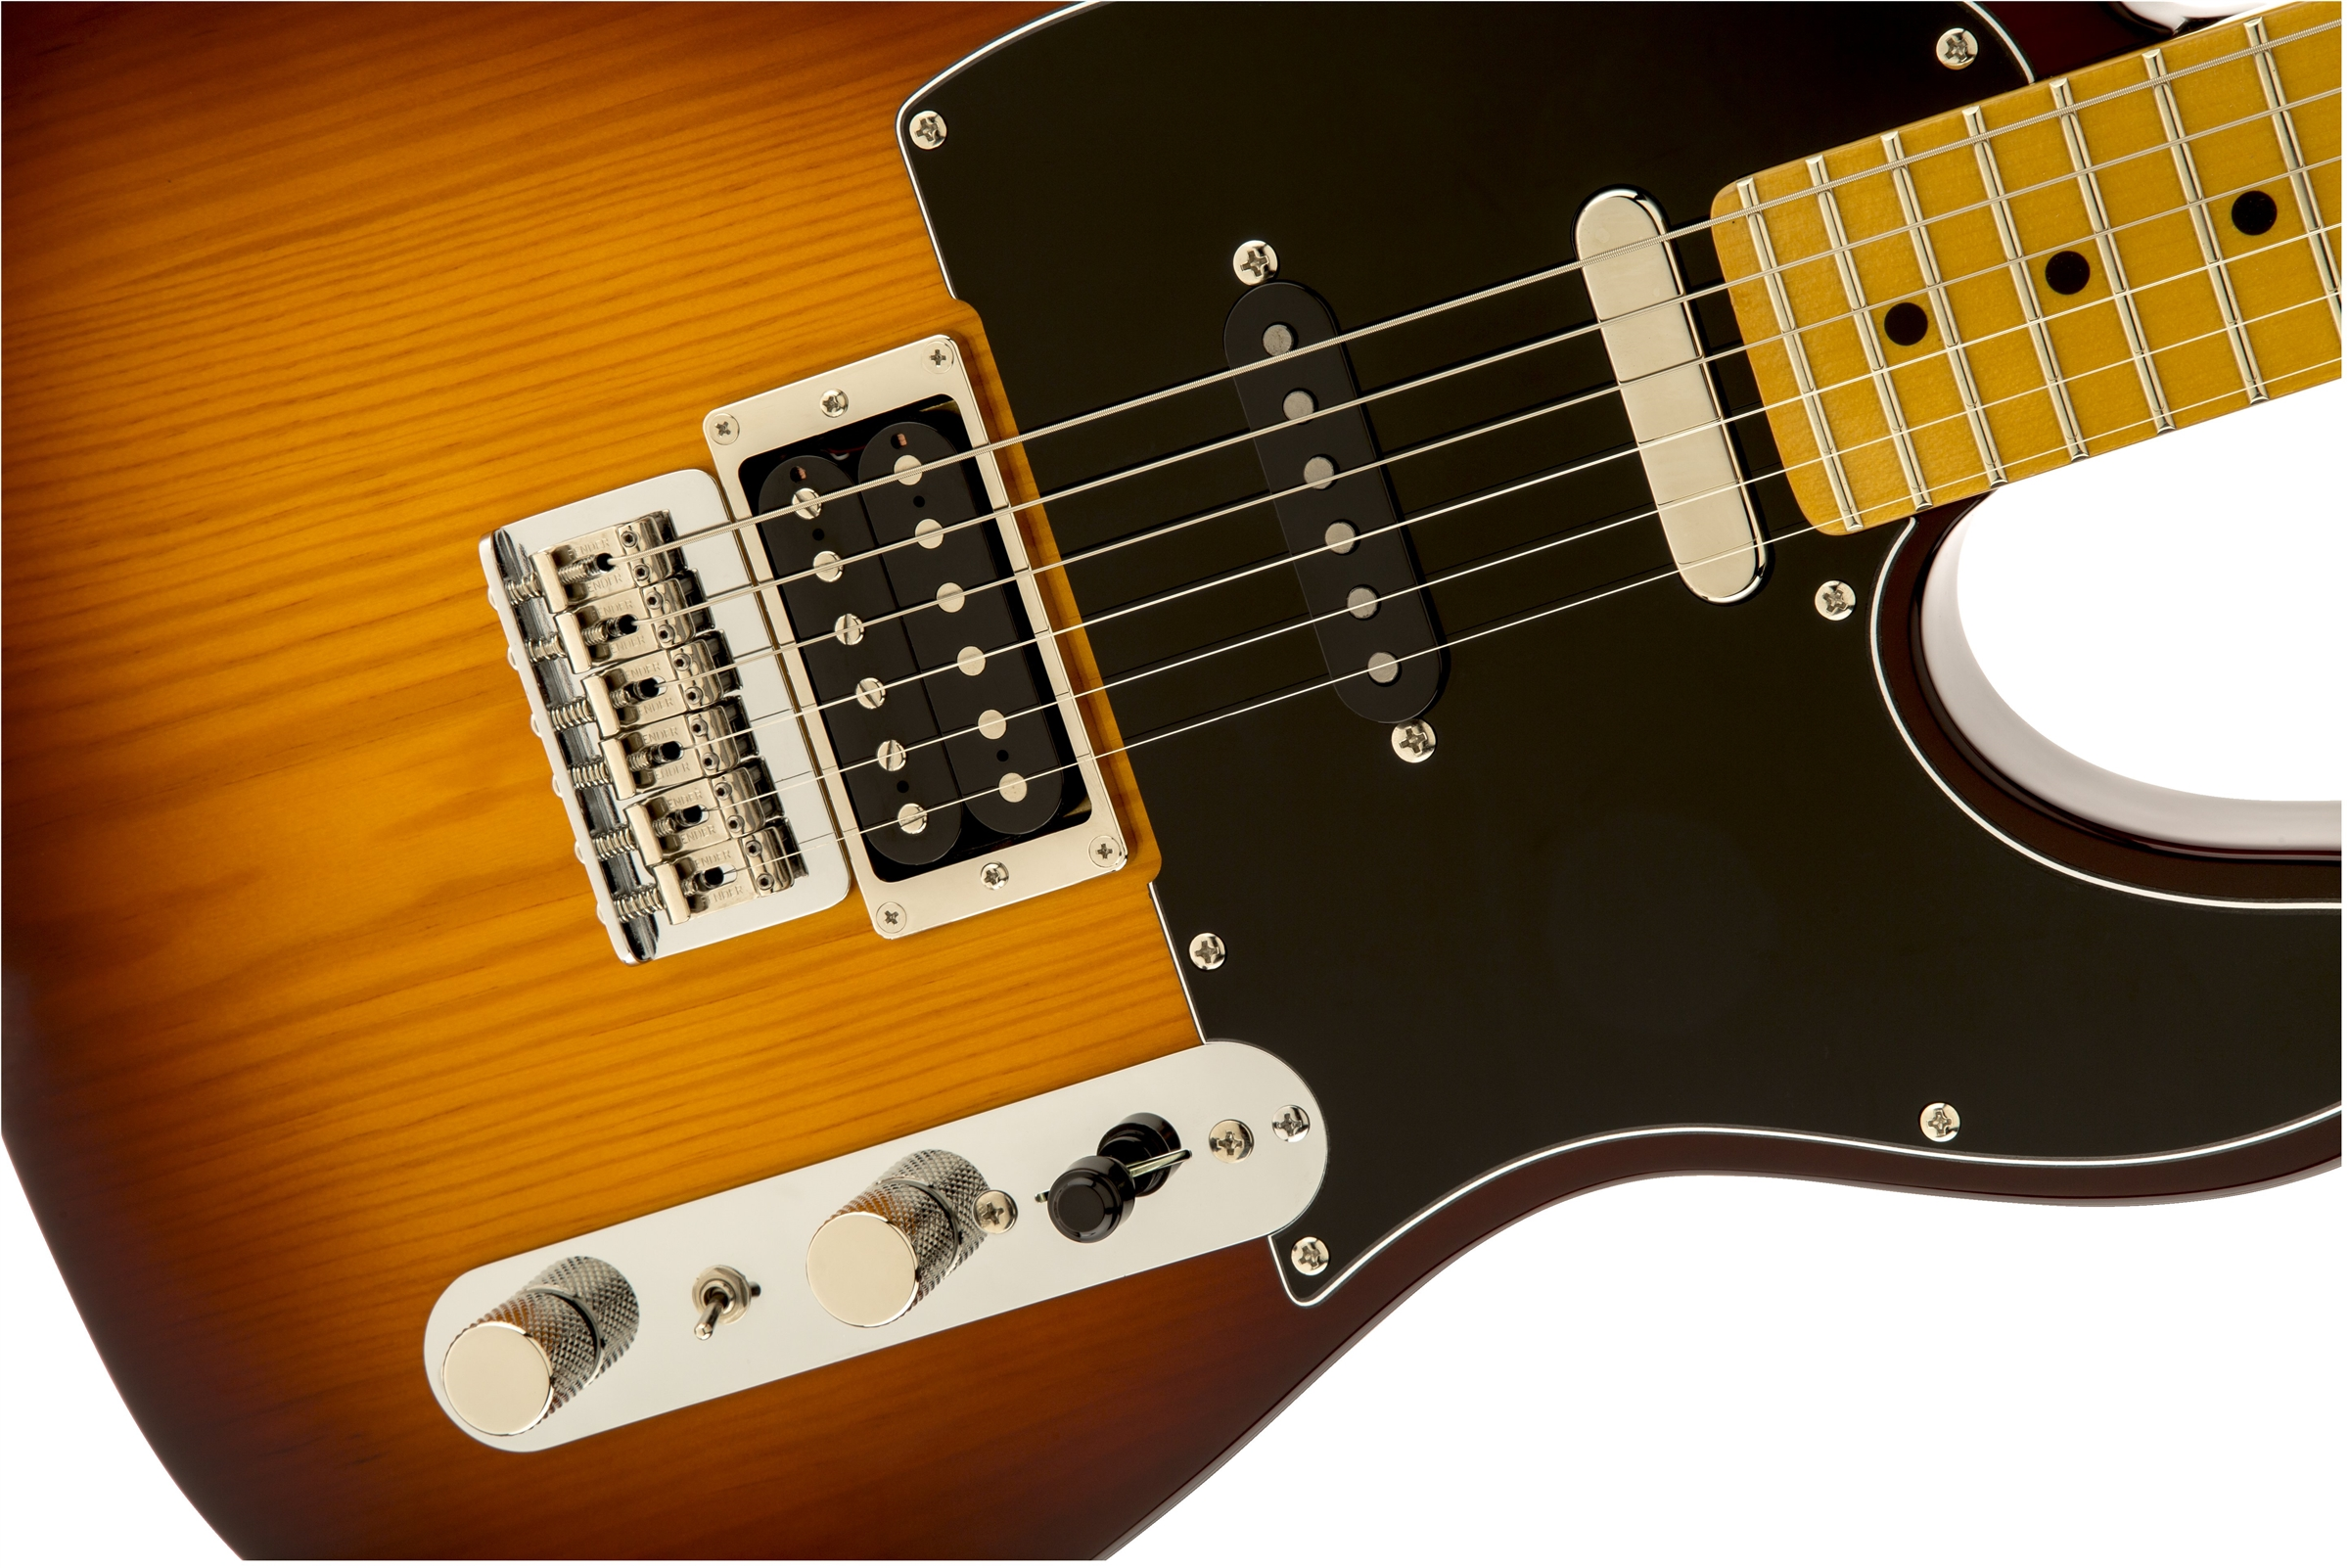 telecaster wiring modern und vintage ceiling fan remote control diagram player plus fender electric guitars